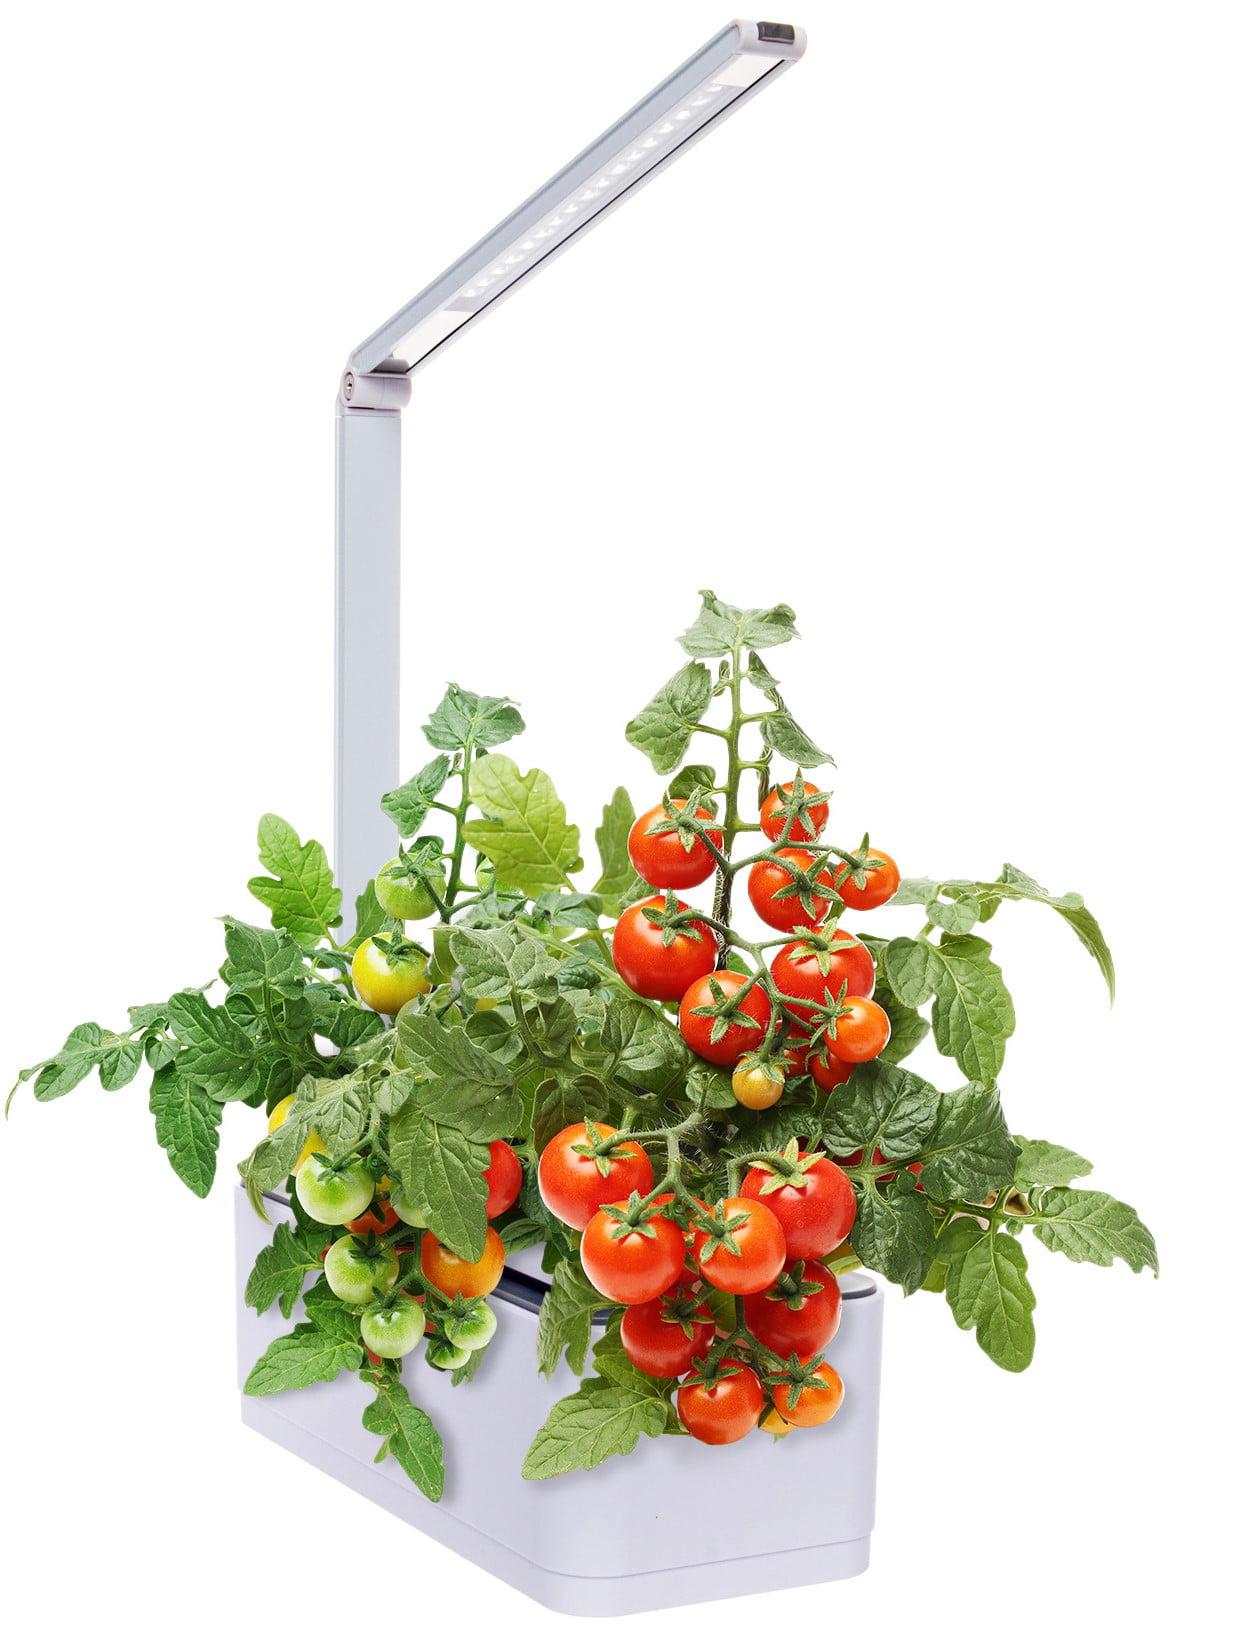 Mindful Design Hydroponic Desktop Herb Garden w/ Multispectrum LED Growing  Lamp